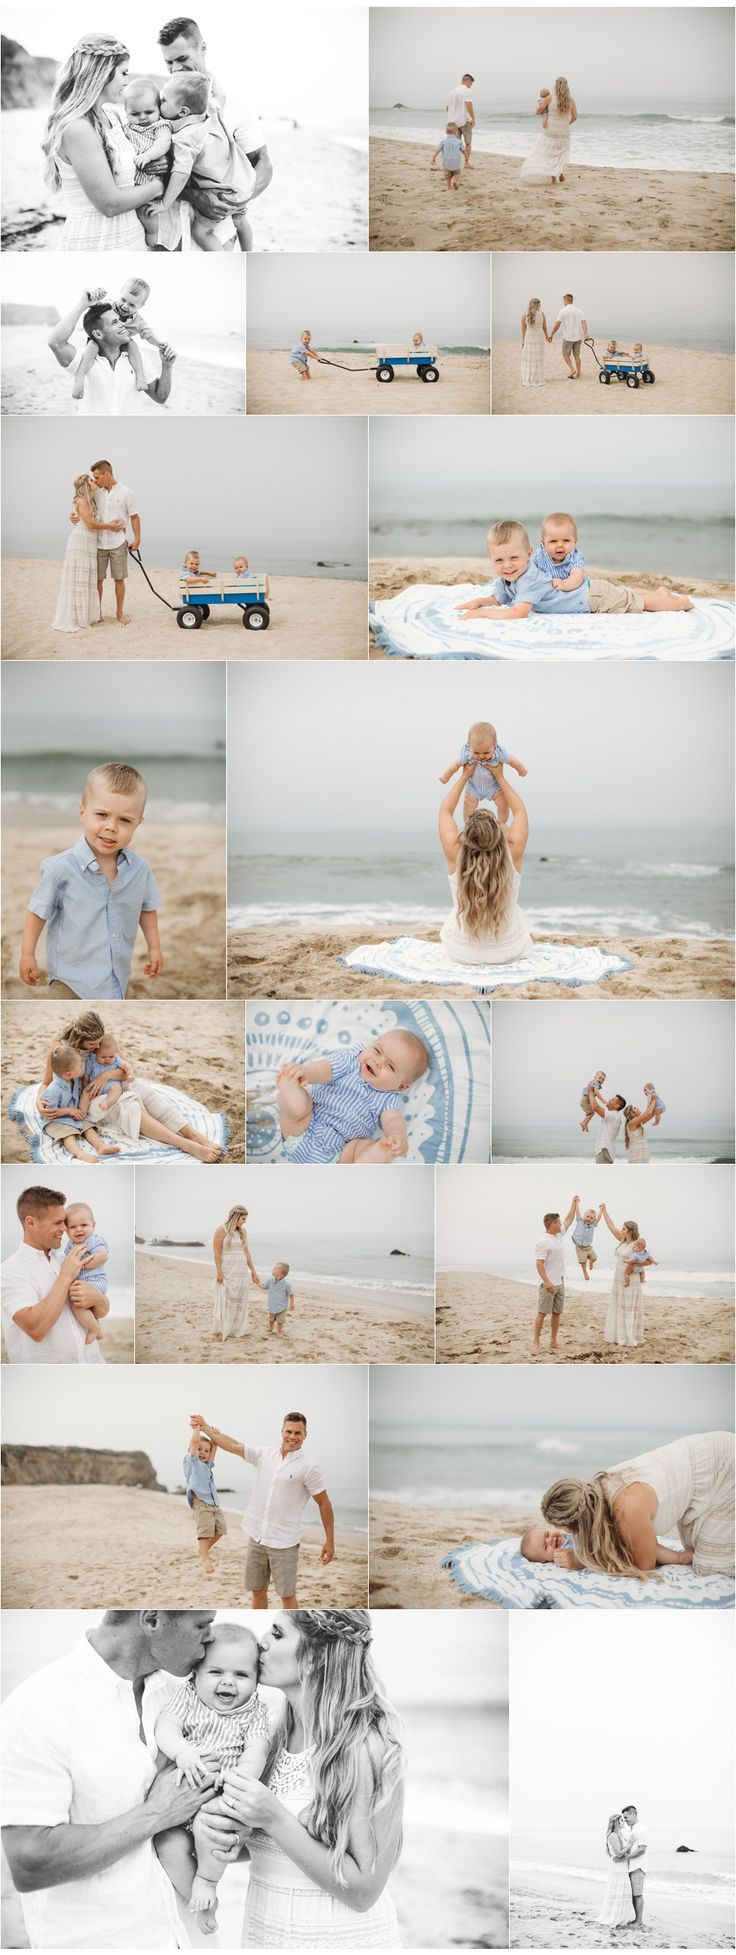 Best Beach Photography : San Francisco Bay Area Maternity Newborn Child & Family Photographer – kayla horner